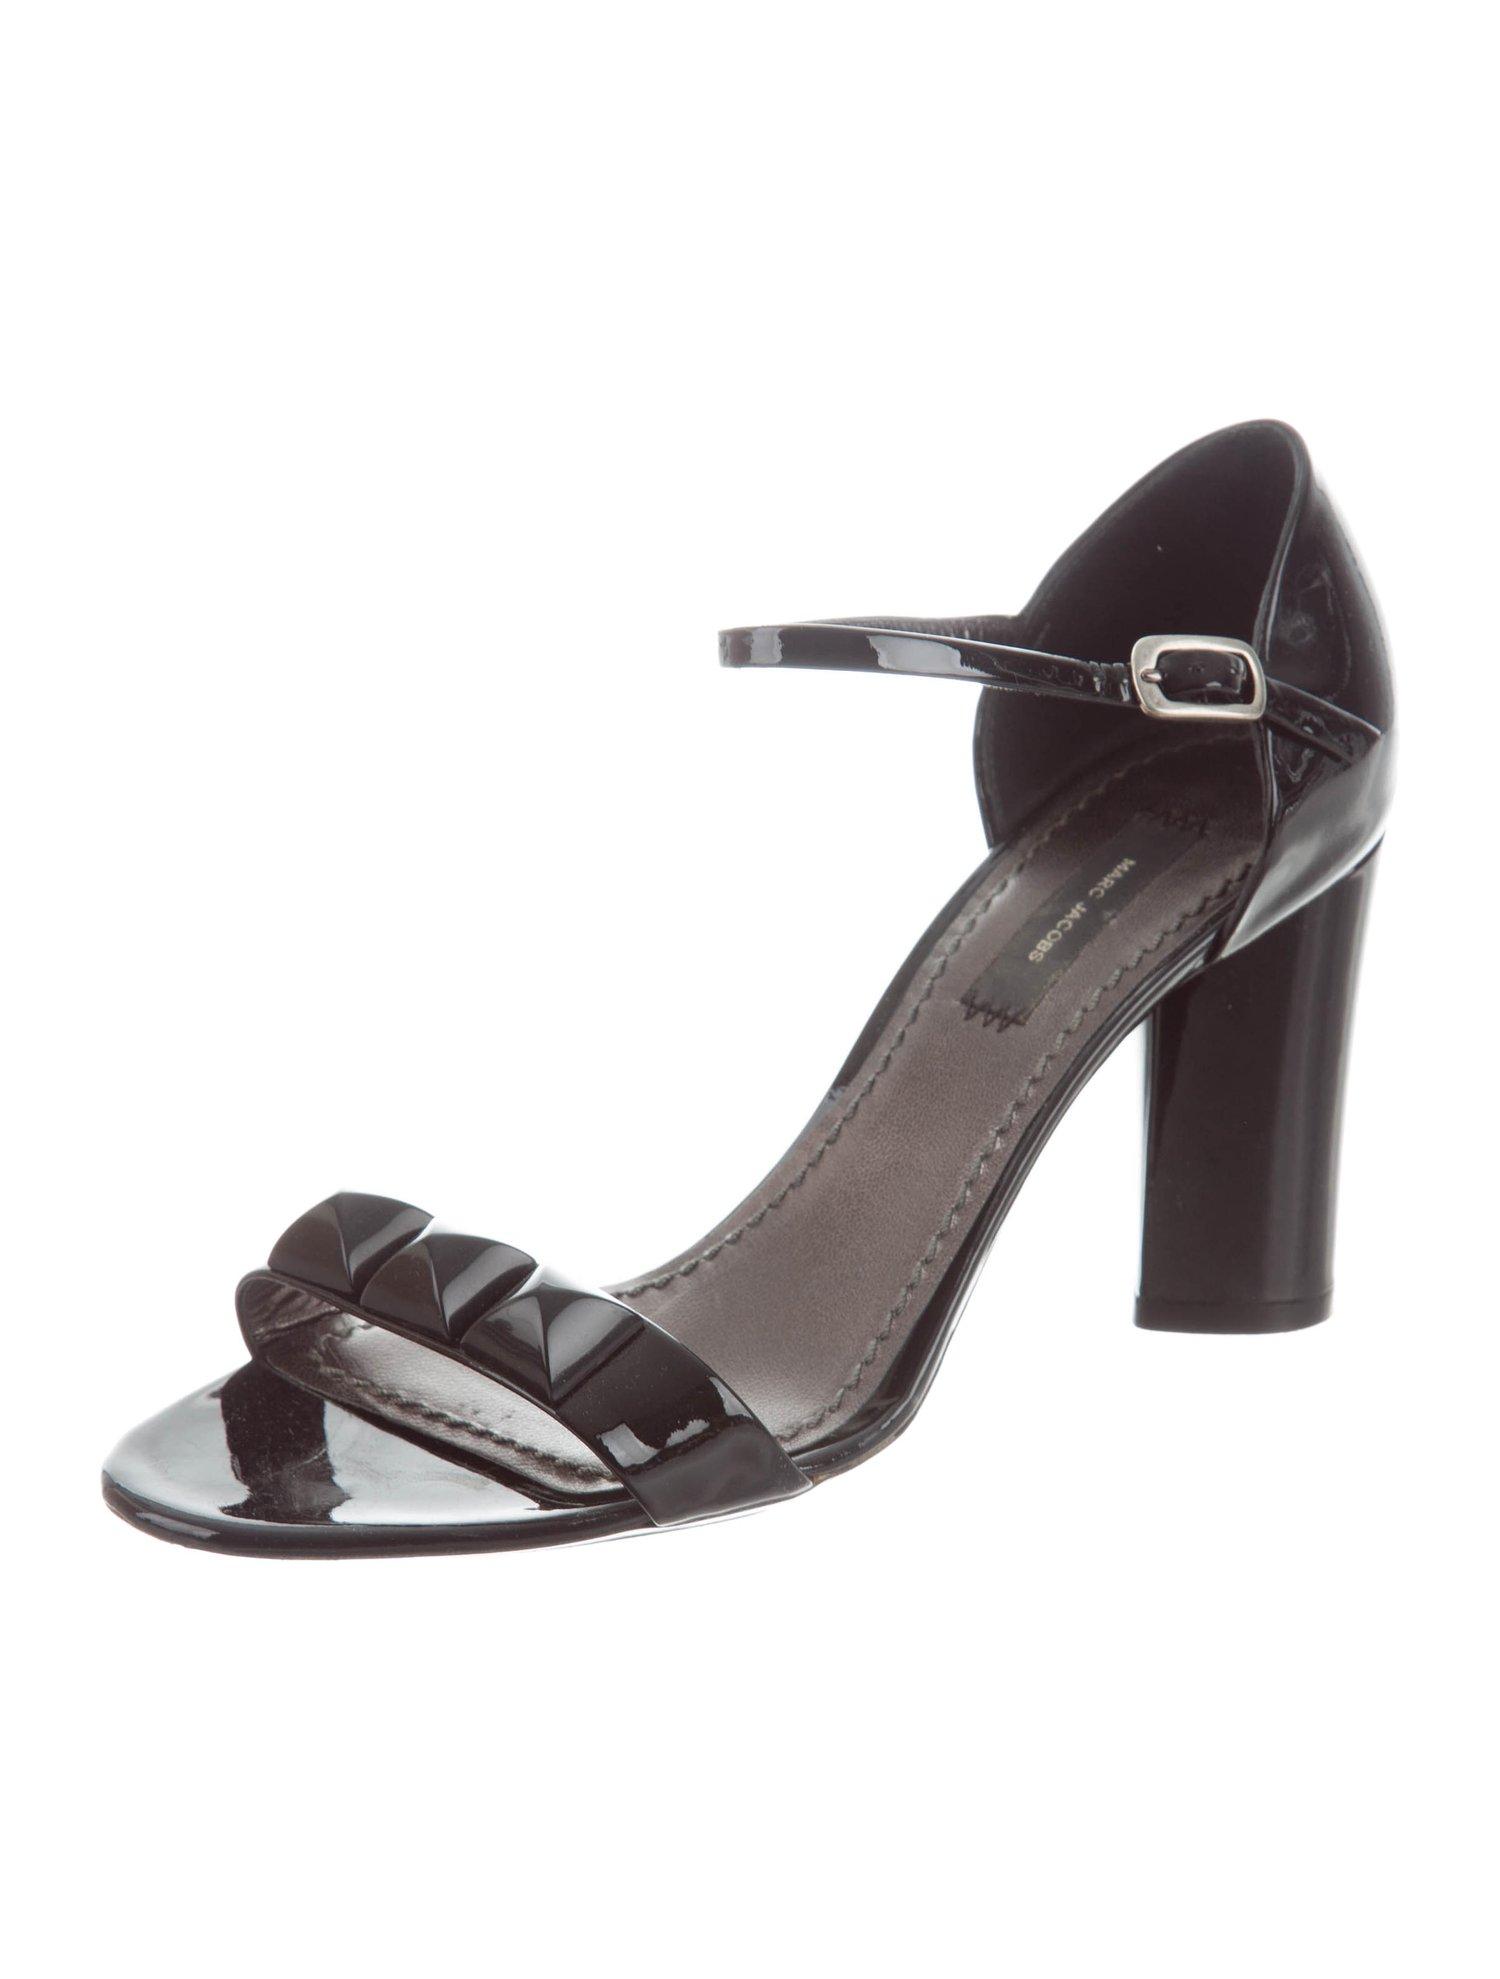 01c09259e87 Shoes | Gagapedia | FANDOM powered by Wikia